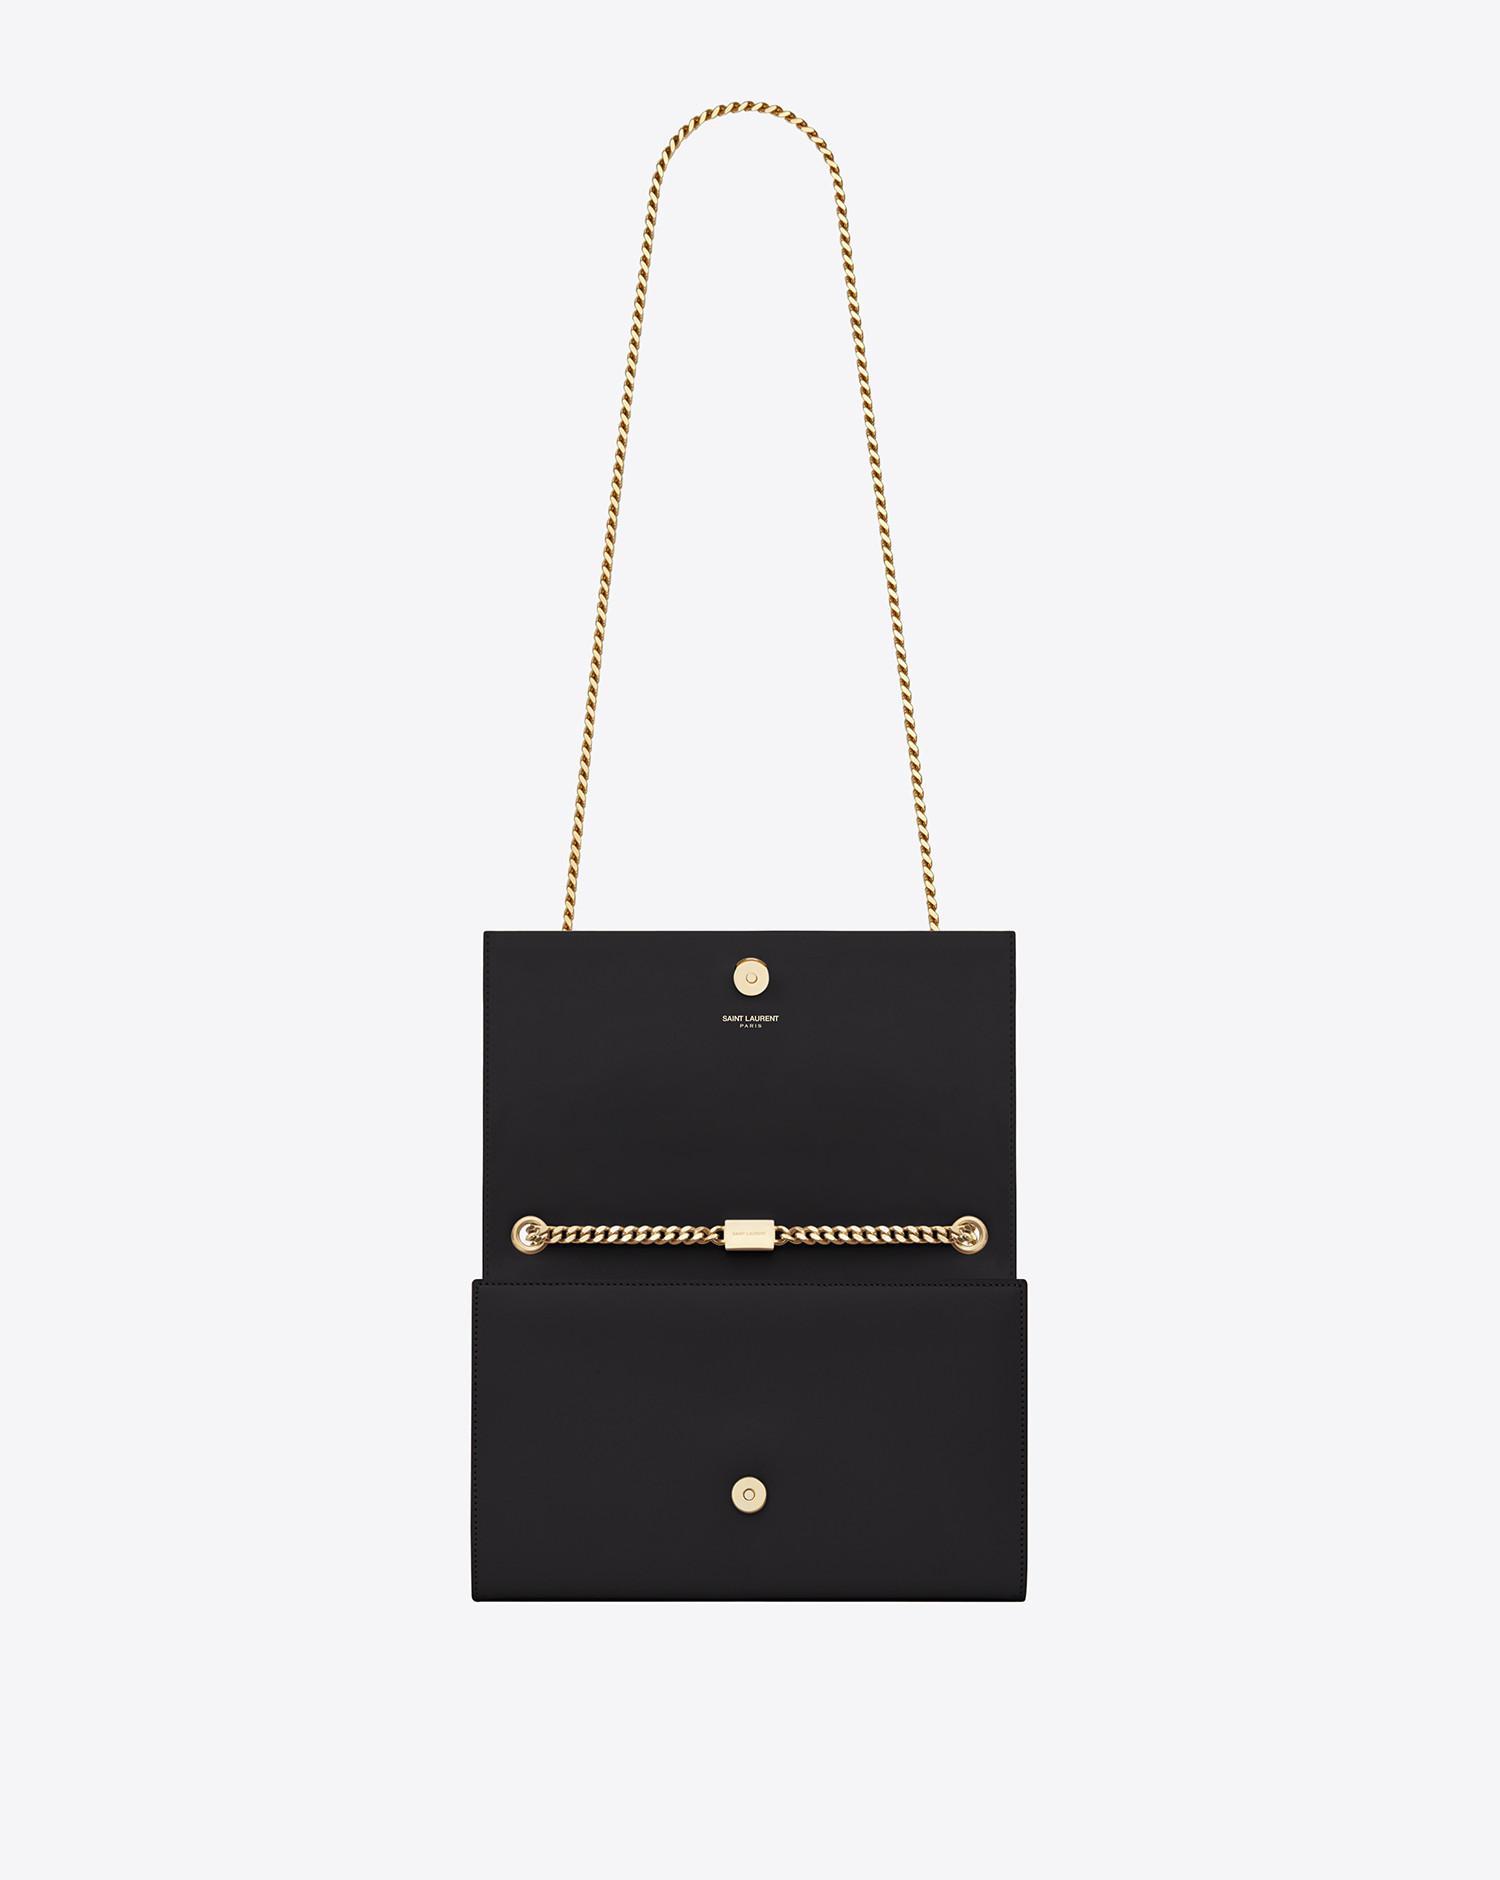 Saint Laurent - Black Classic Medium Kate Monogram Leather Shoulder Bag -  Lyst. View fullscreen 95d664c789d91